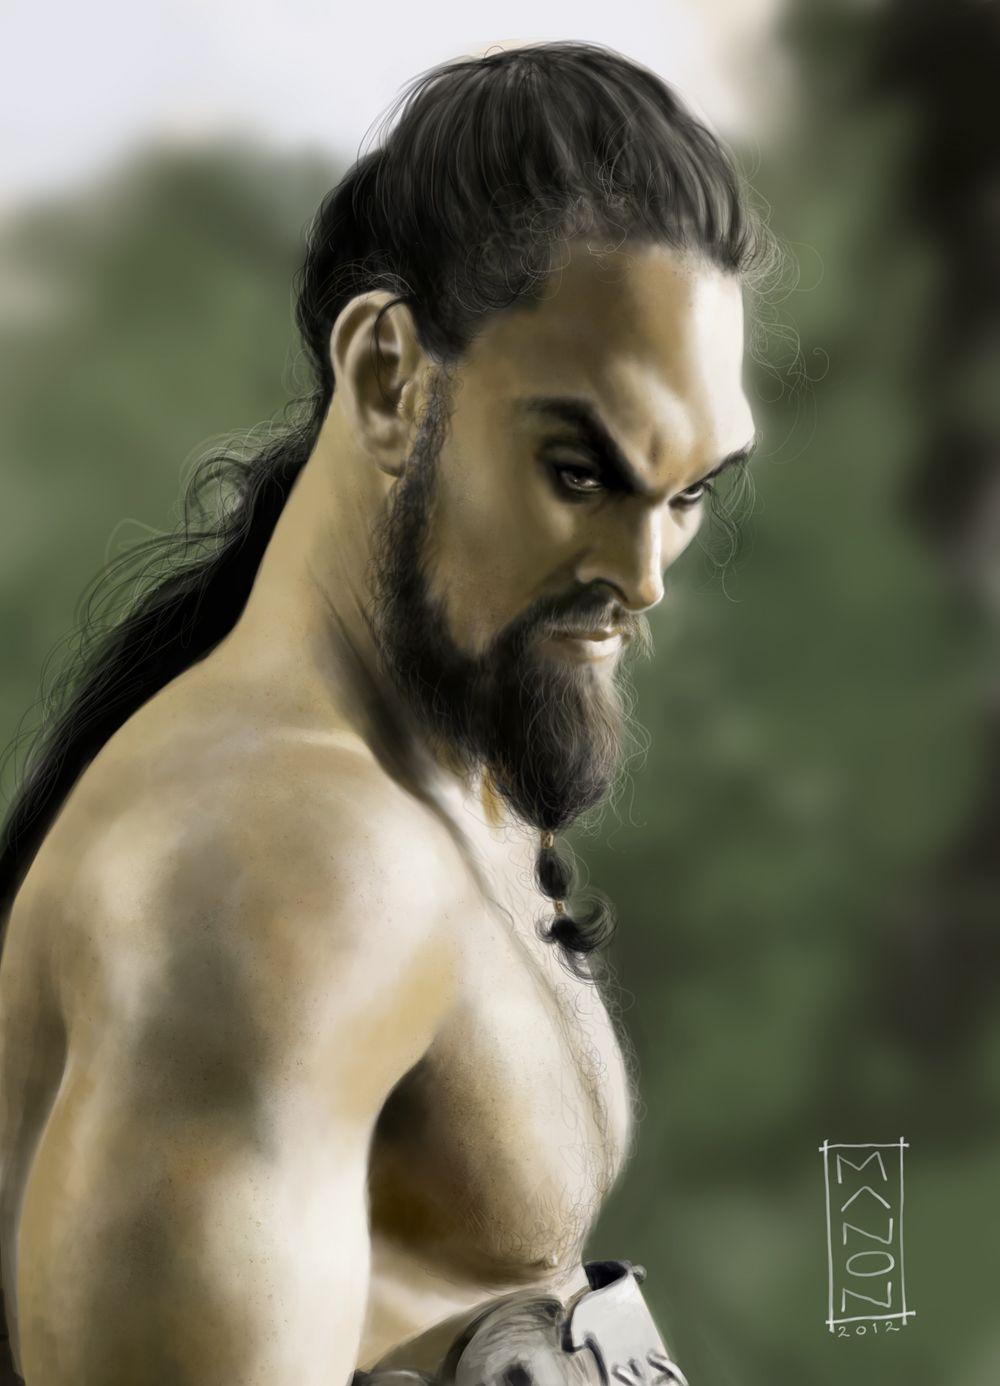 Khal Drogo Caricature by ArtByManon.deviantart.com on @deviantART